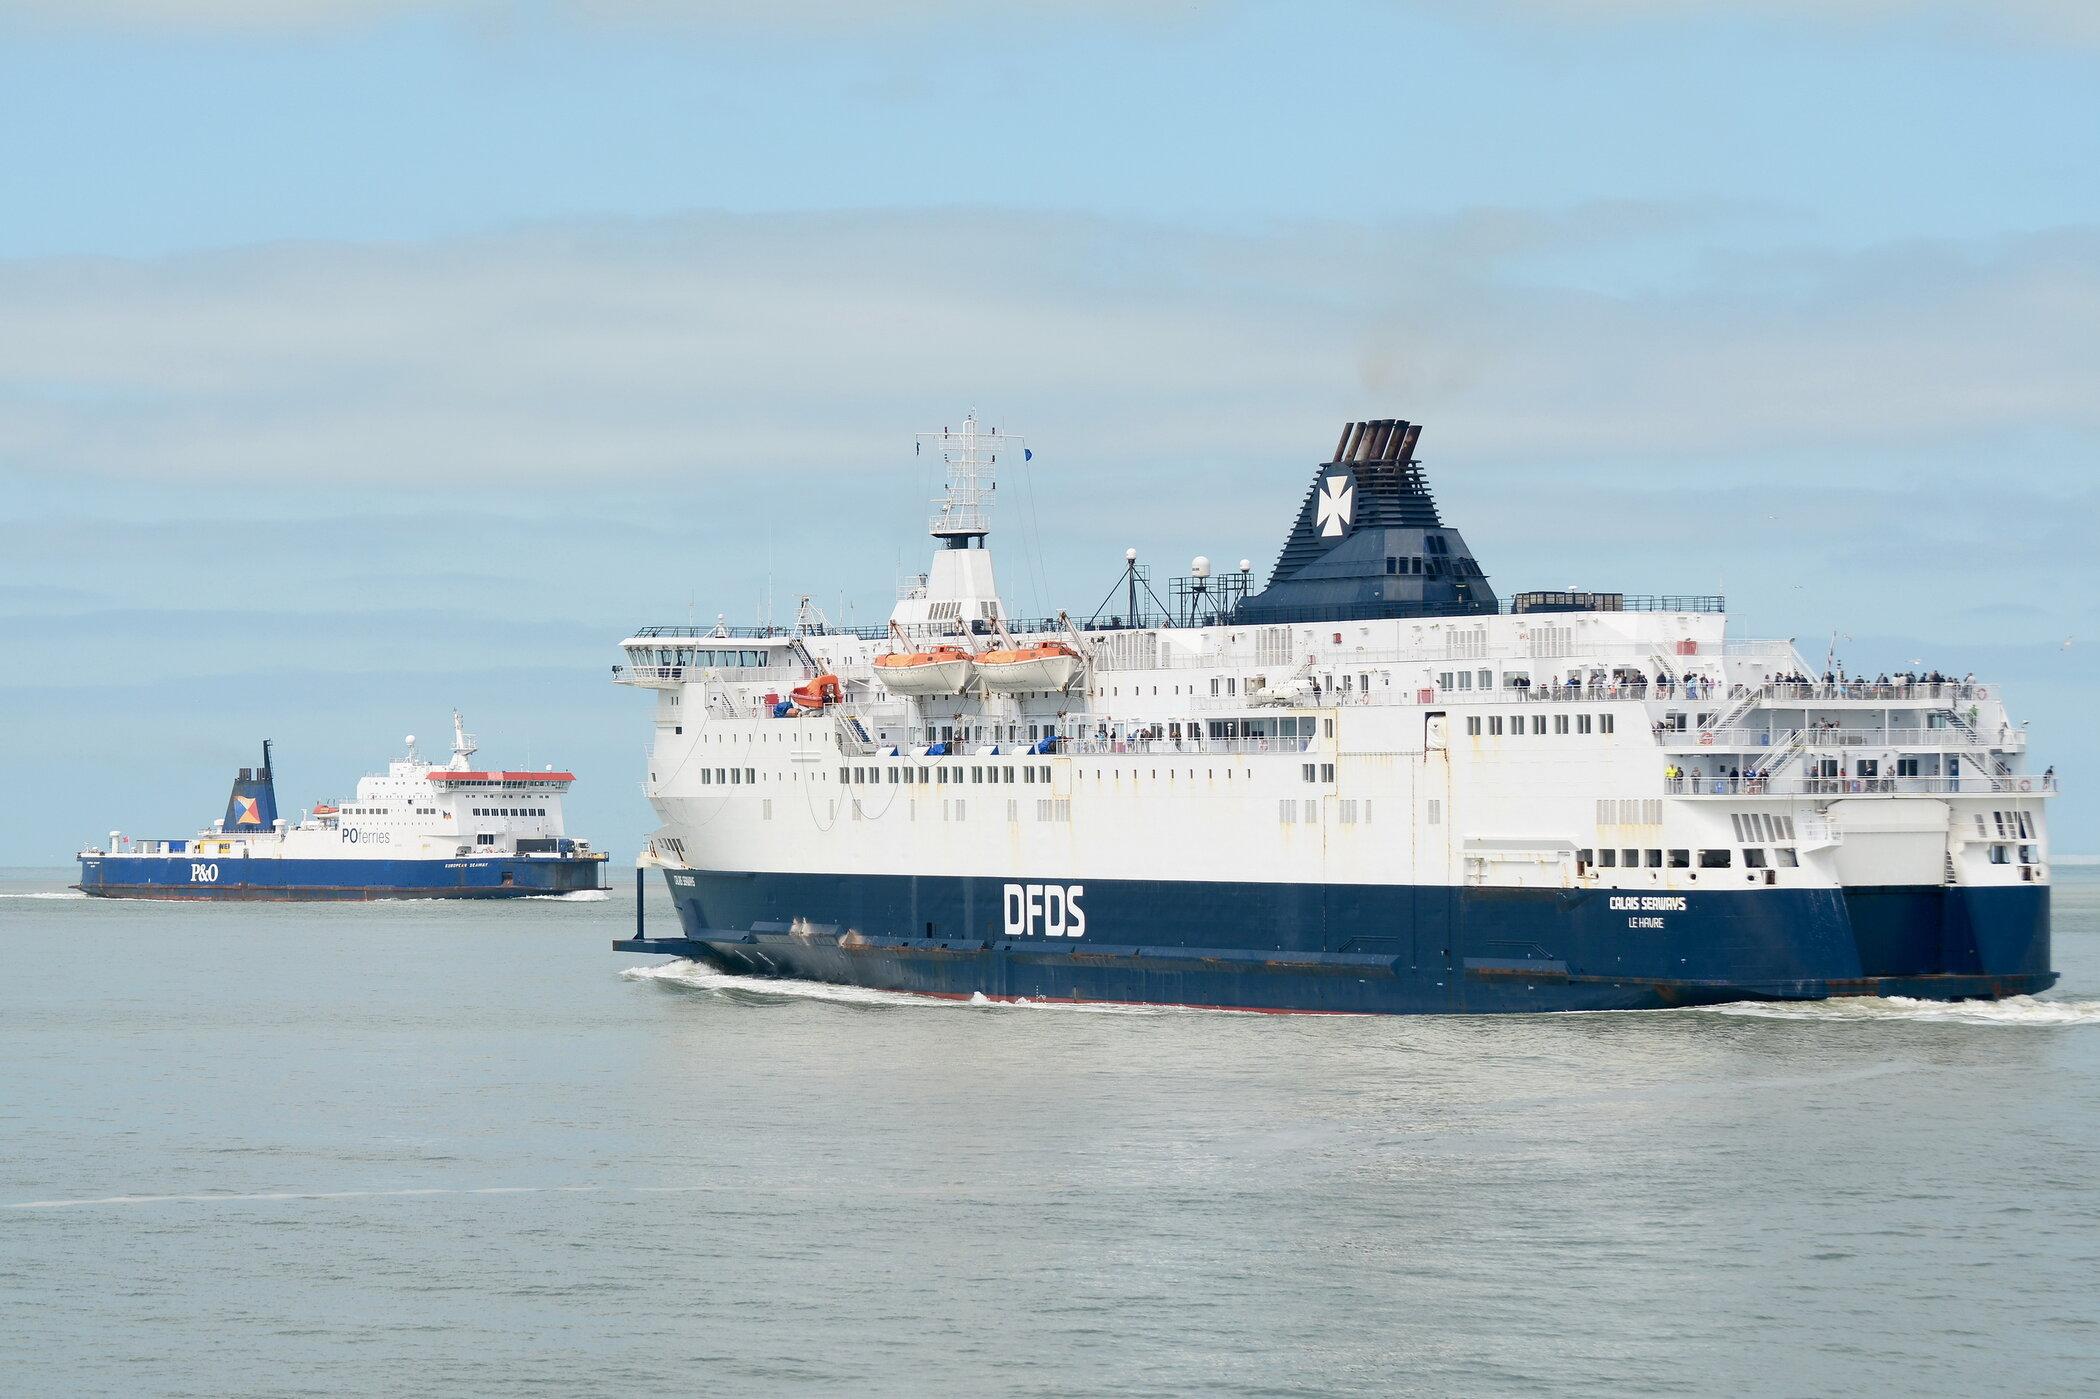 European Seaway_Calais Seaways_19-05-18_Calais